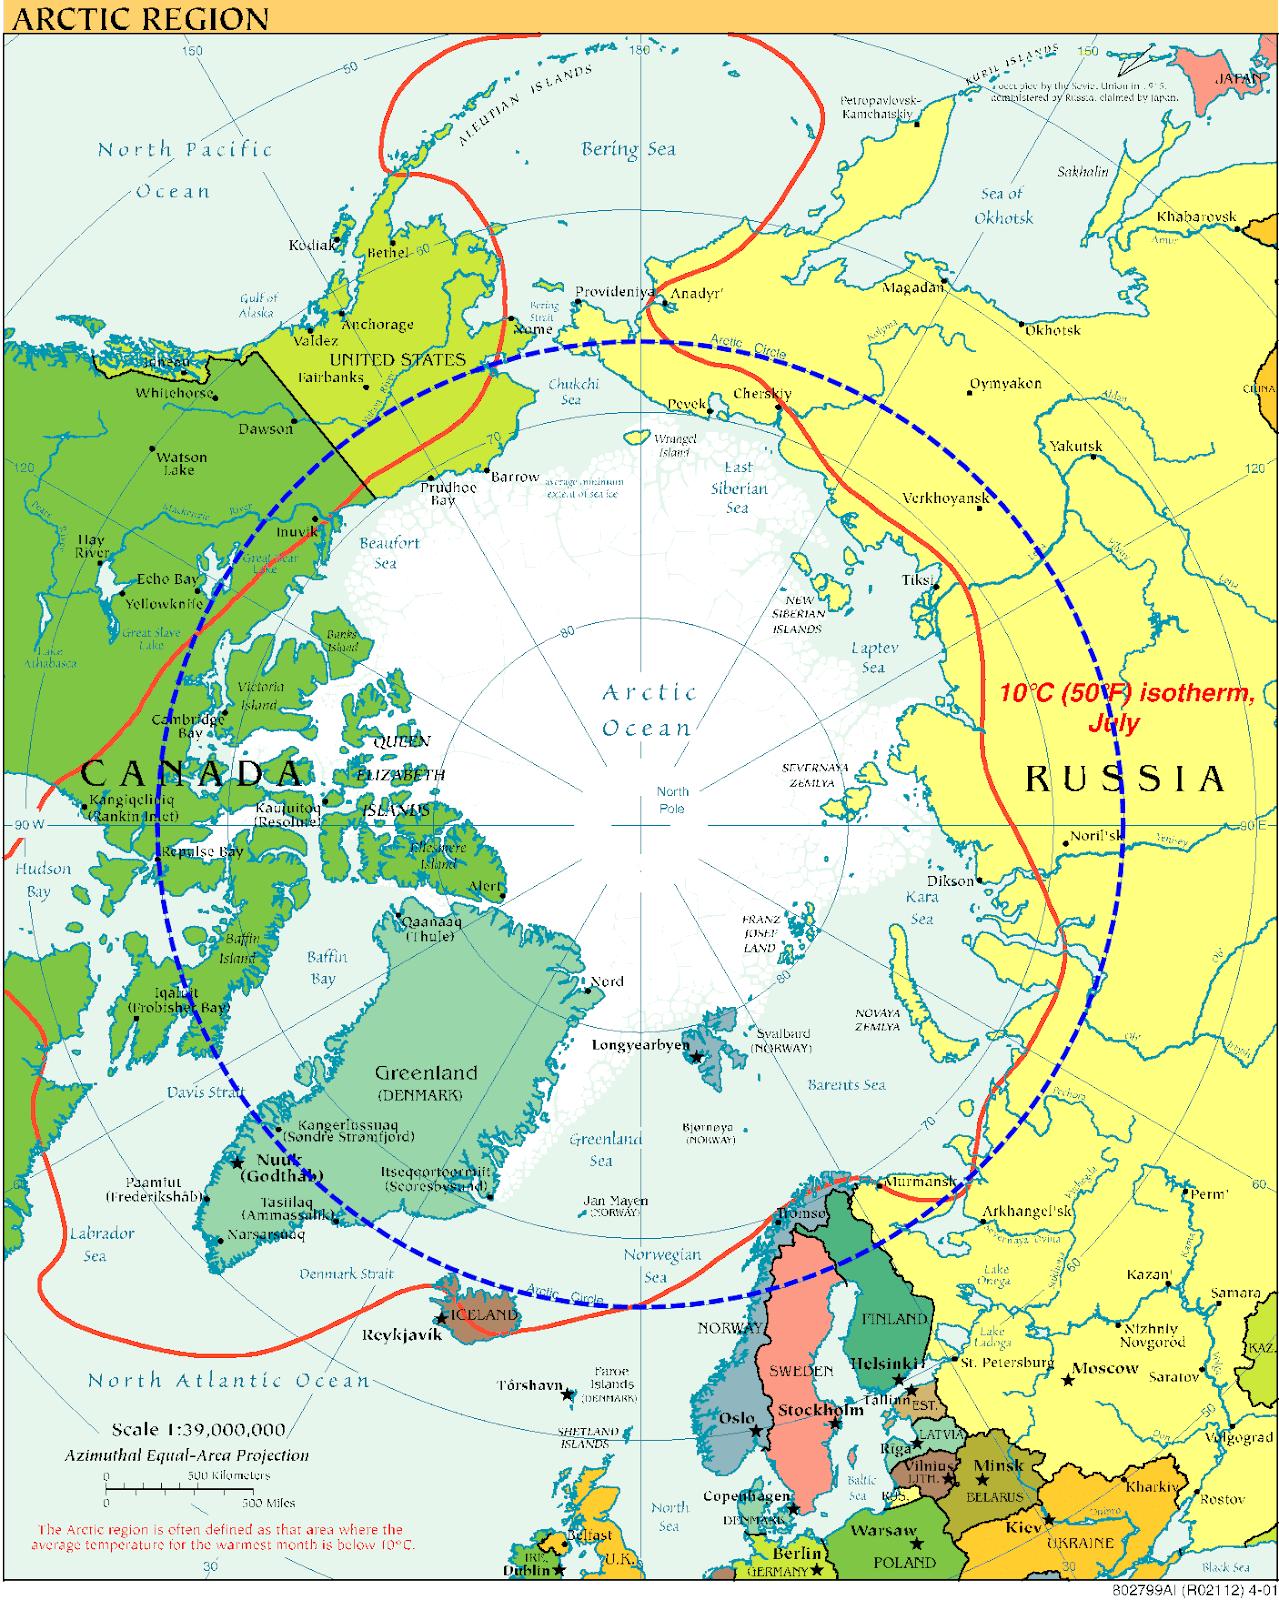 Arctic Circle, University of Texas Austin | Wikimedia Commons